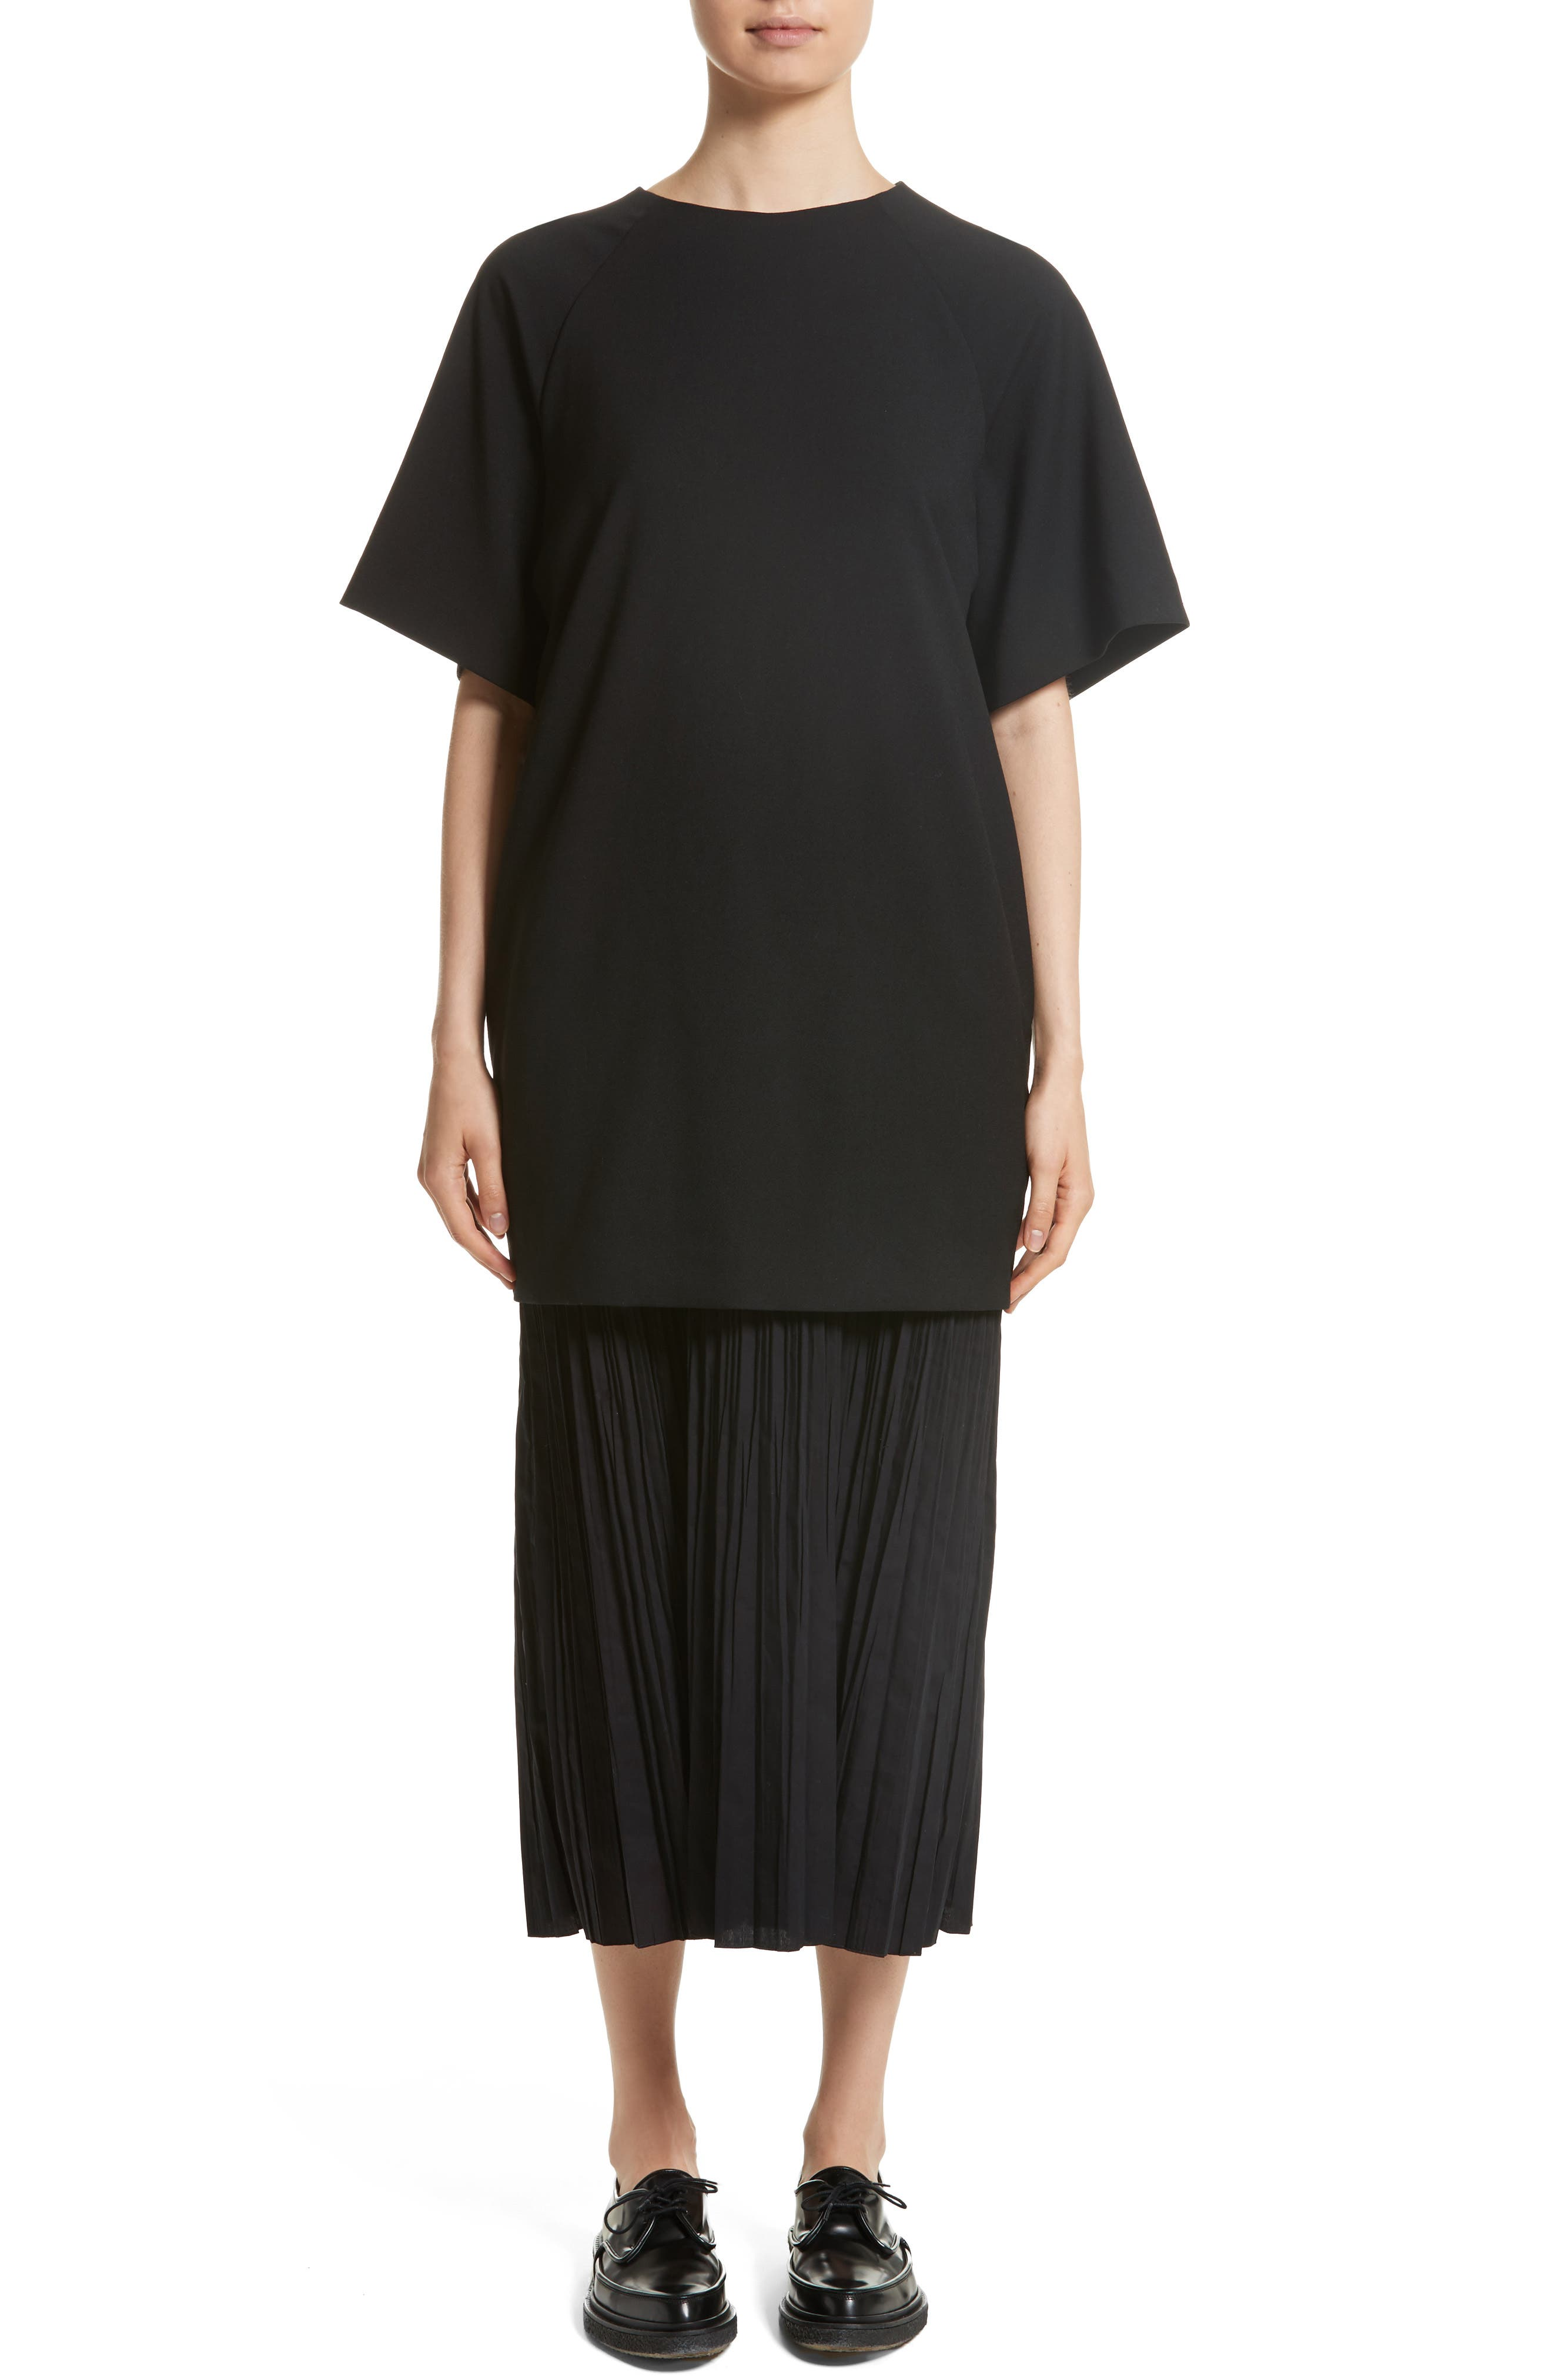 K Bottom Pleated Dress,                         Main,                         color, 001